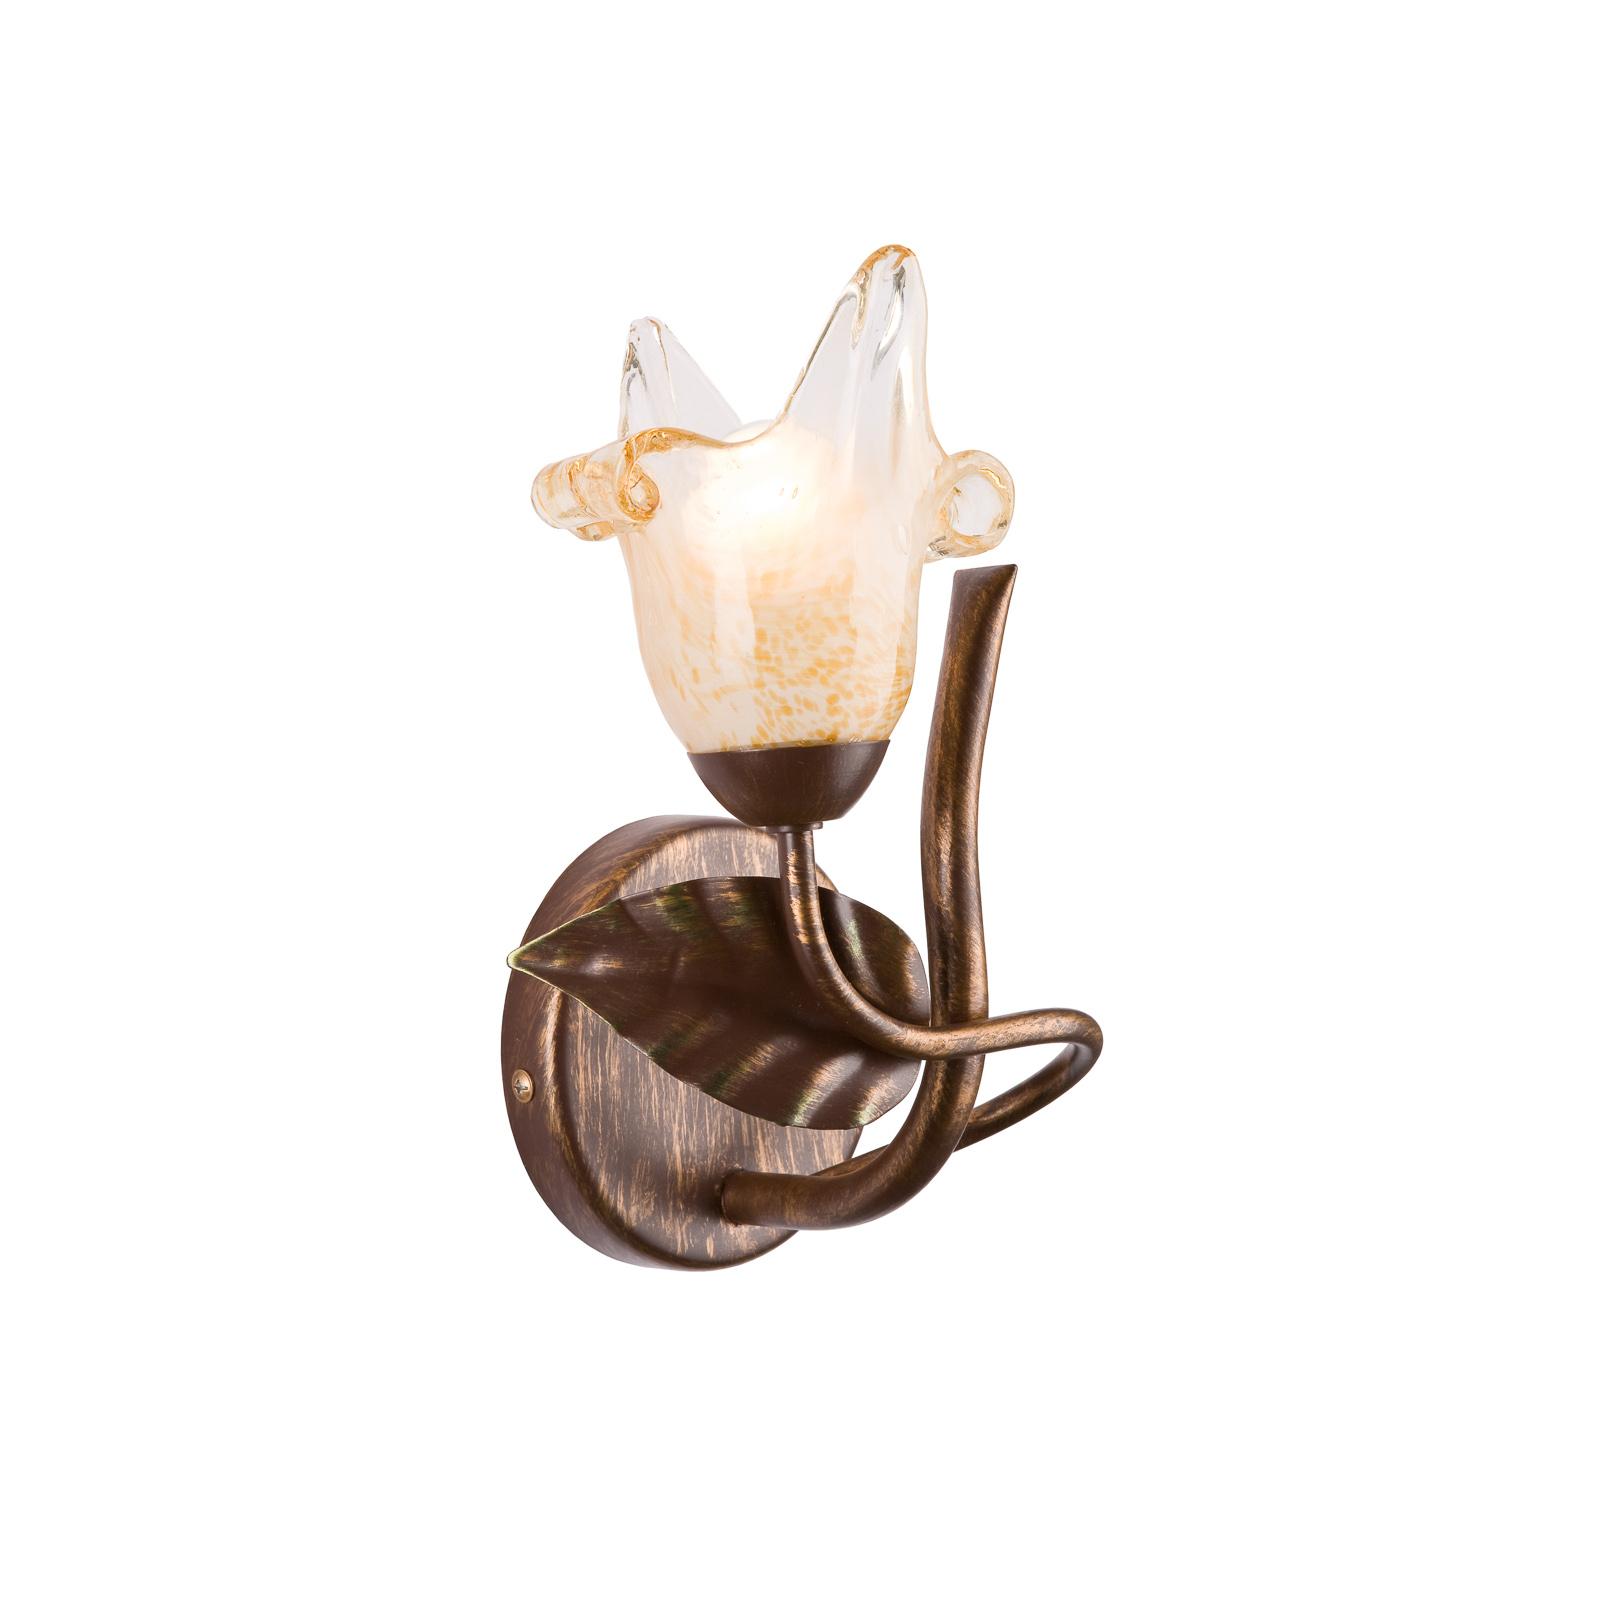 Vegglampe Siena, florentinstil, 1 lyskilde